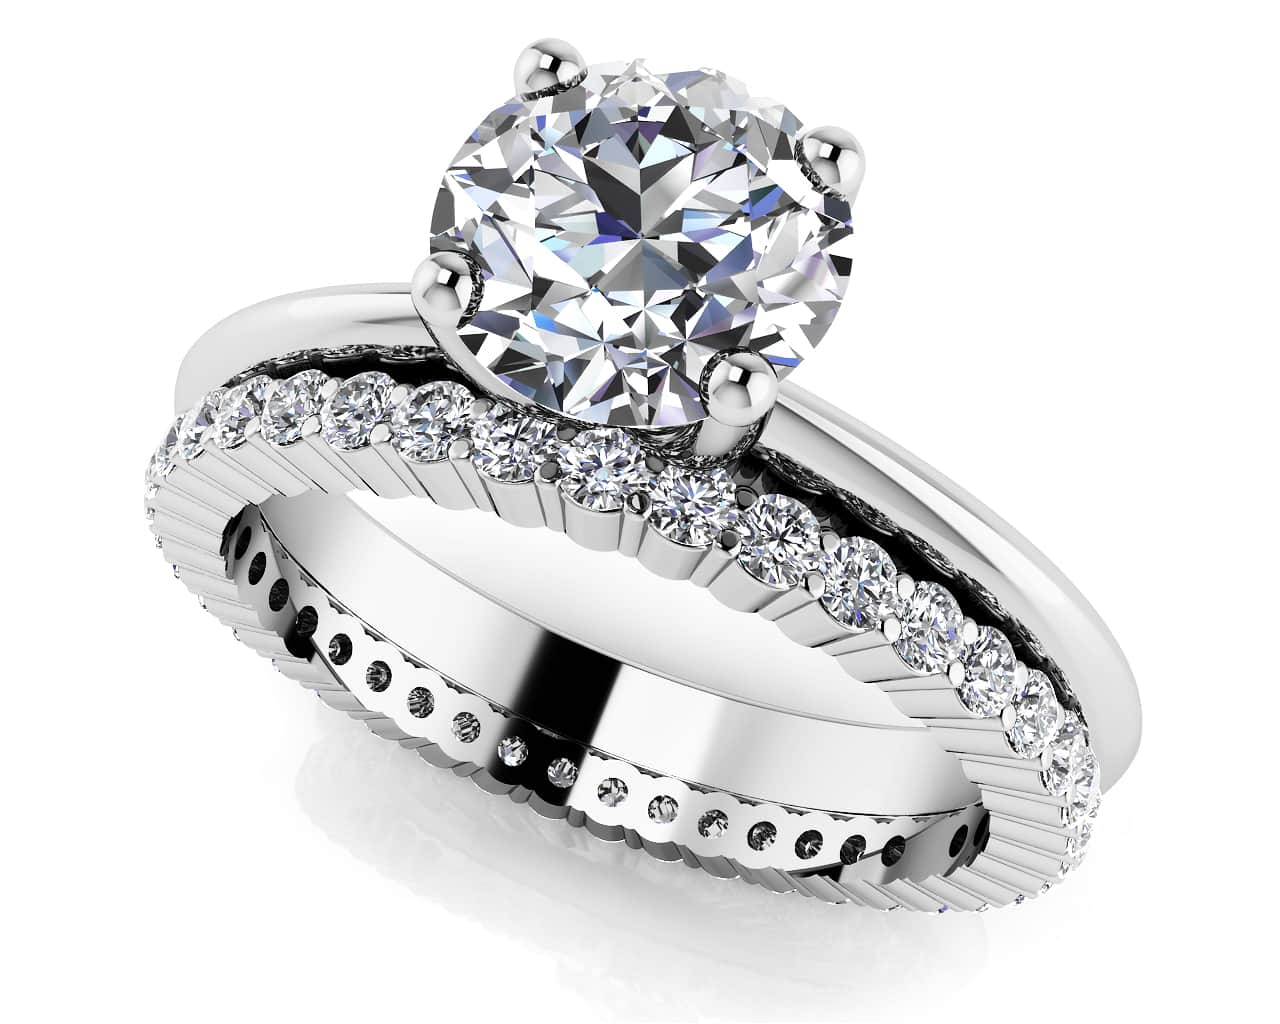 customize your wedding set matching diamond bridal set - Customize Wedding Ring